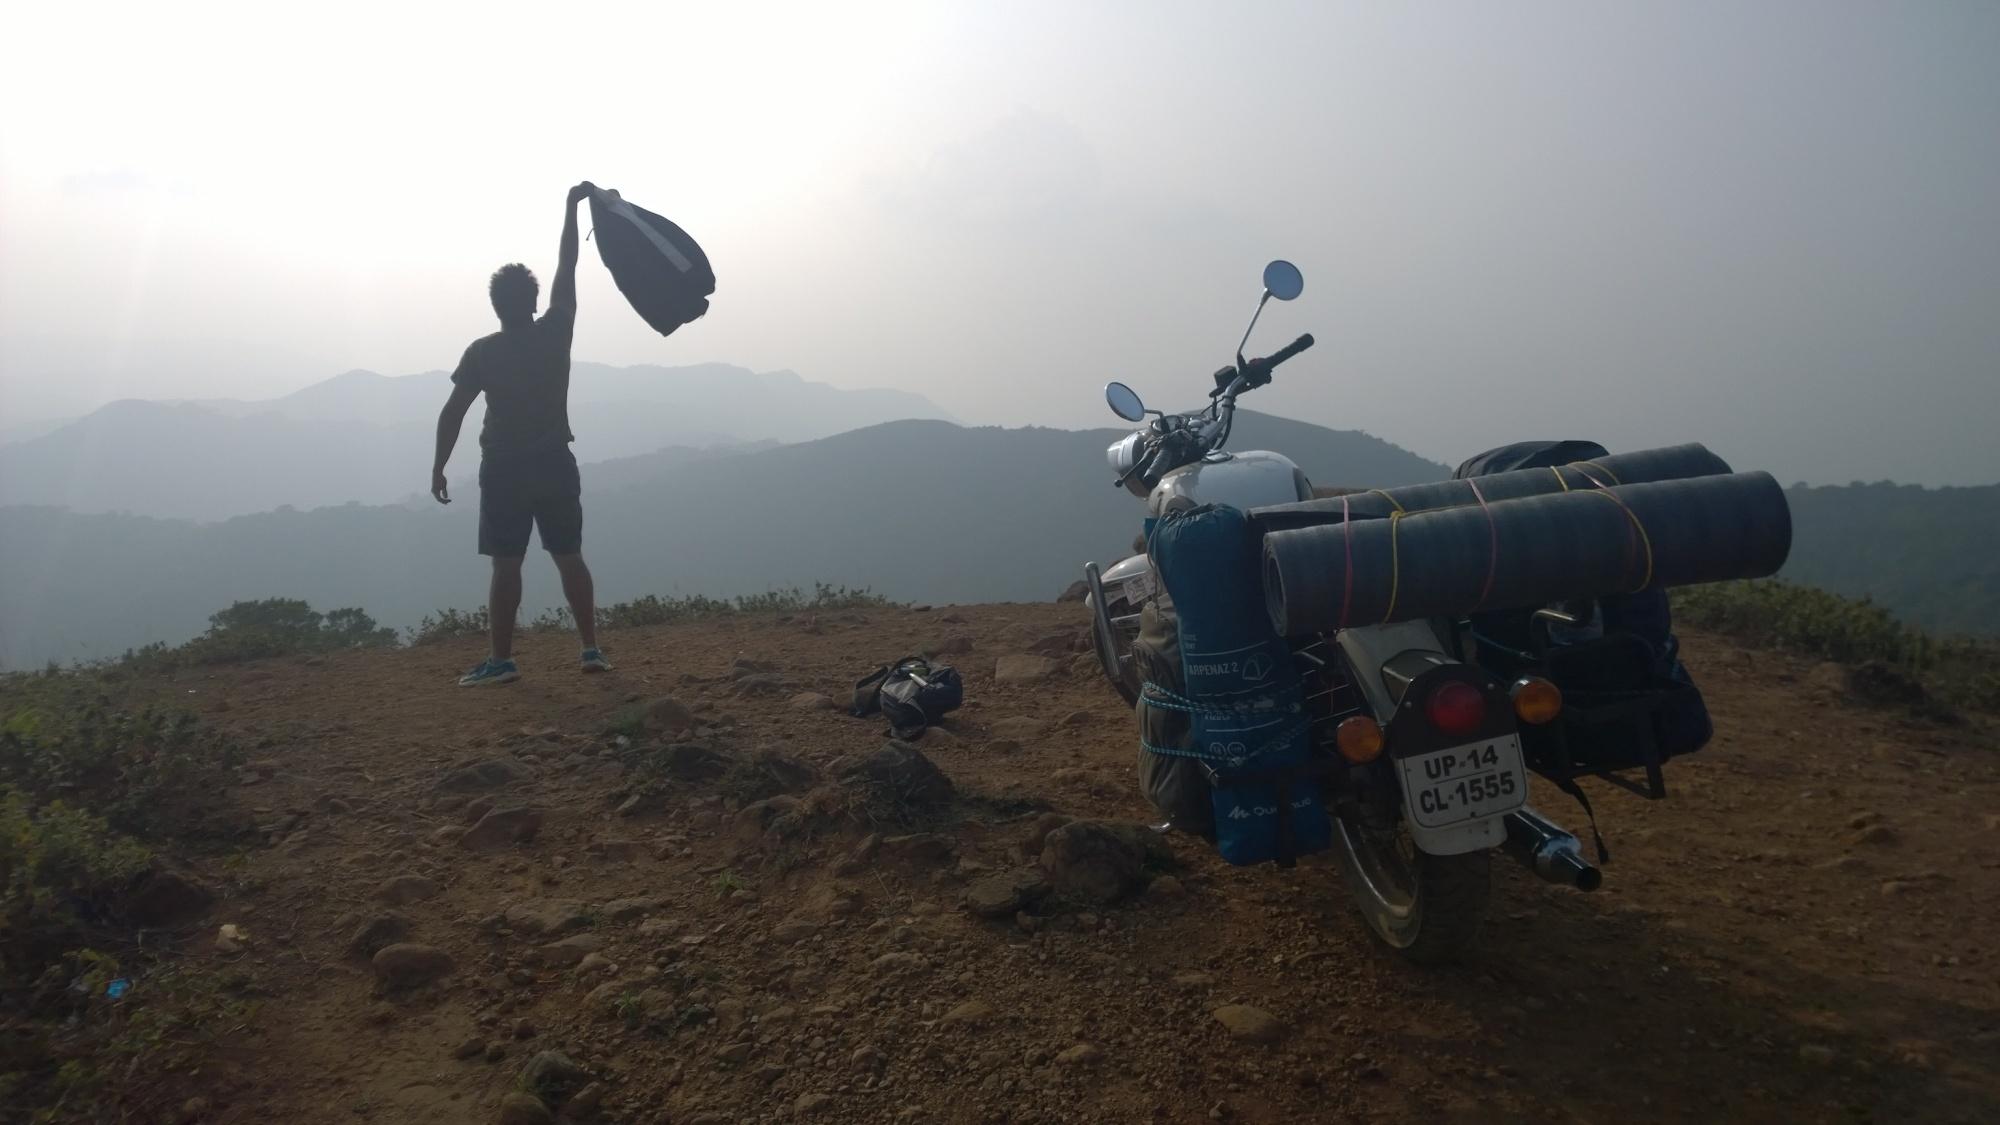 mandalpatti peak camping